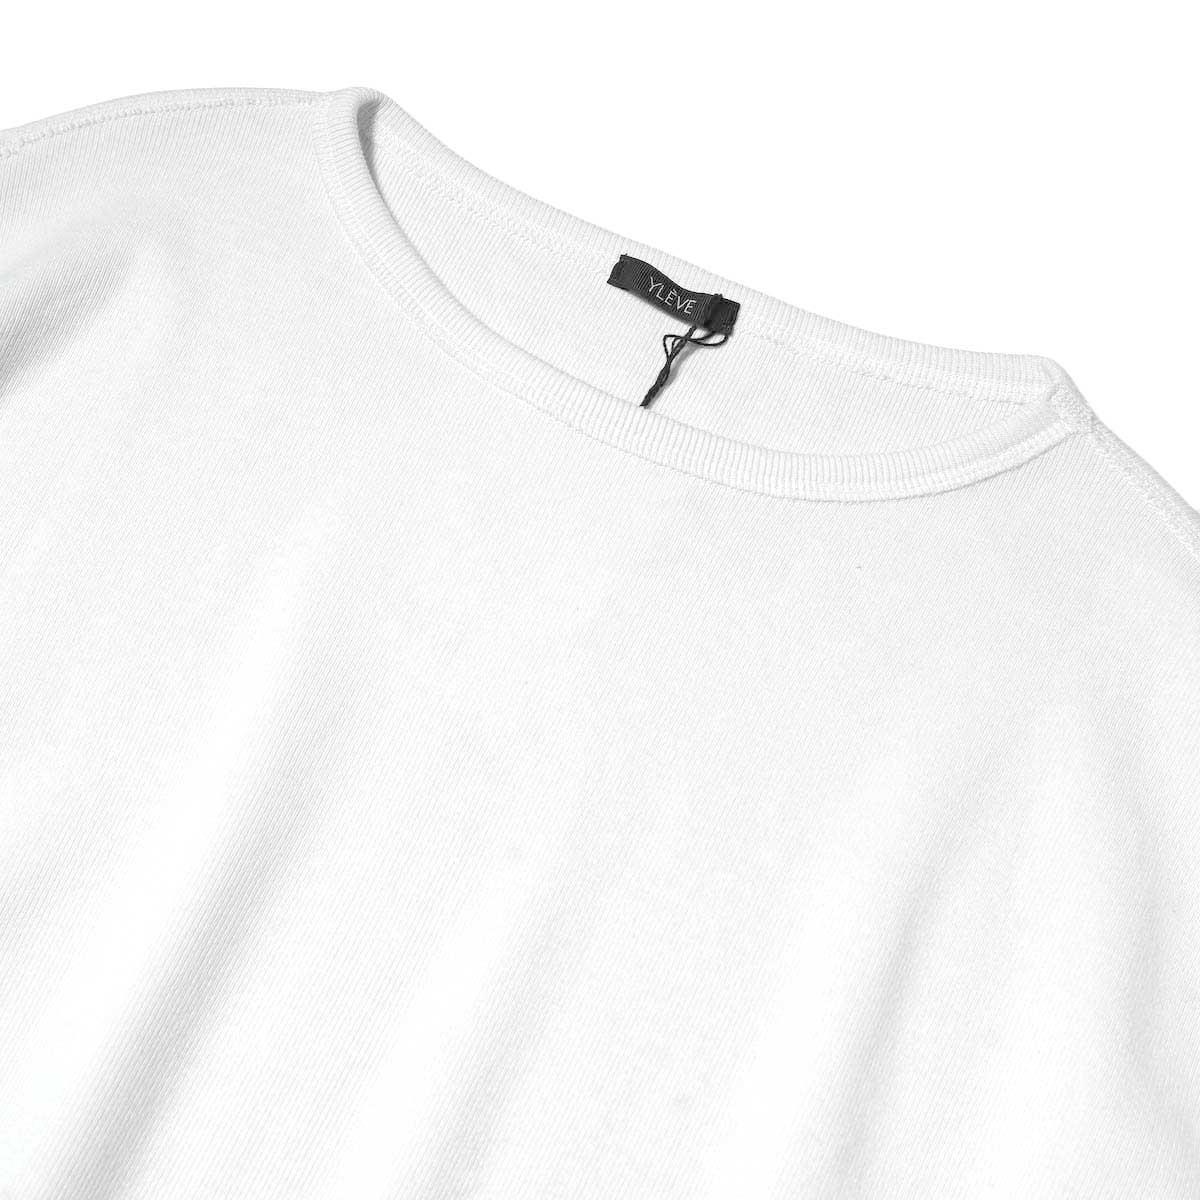 YLEVE / CTN RIB P/O BIG (White) ネック